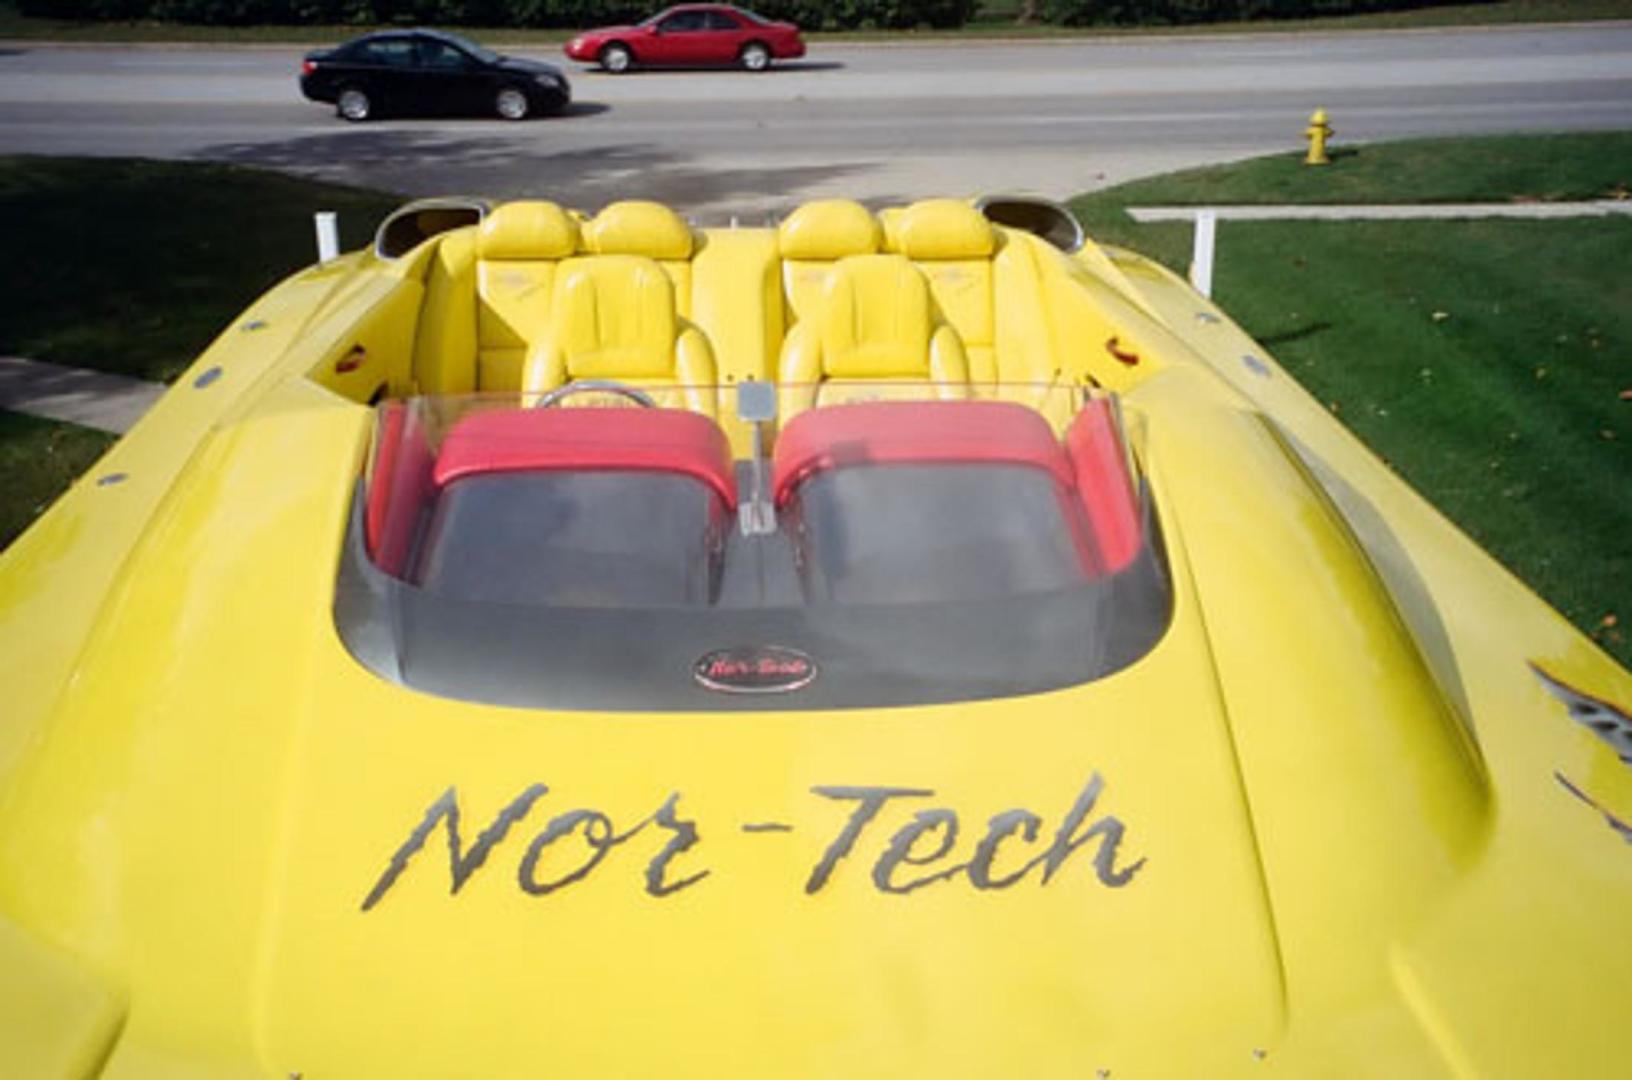 Nor-Tech-5000 Supercat 2002-PREDATOR IV Greenwood-Indiana-United States-300834 | Thumbnail